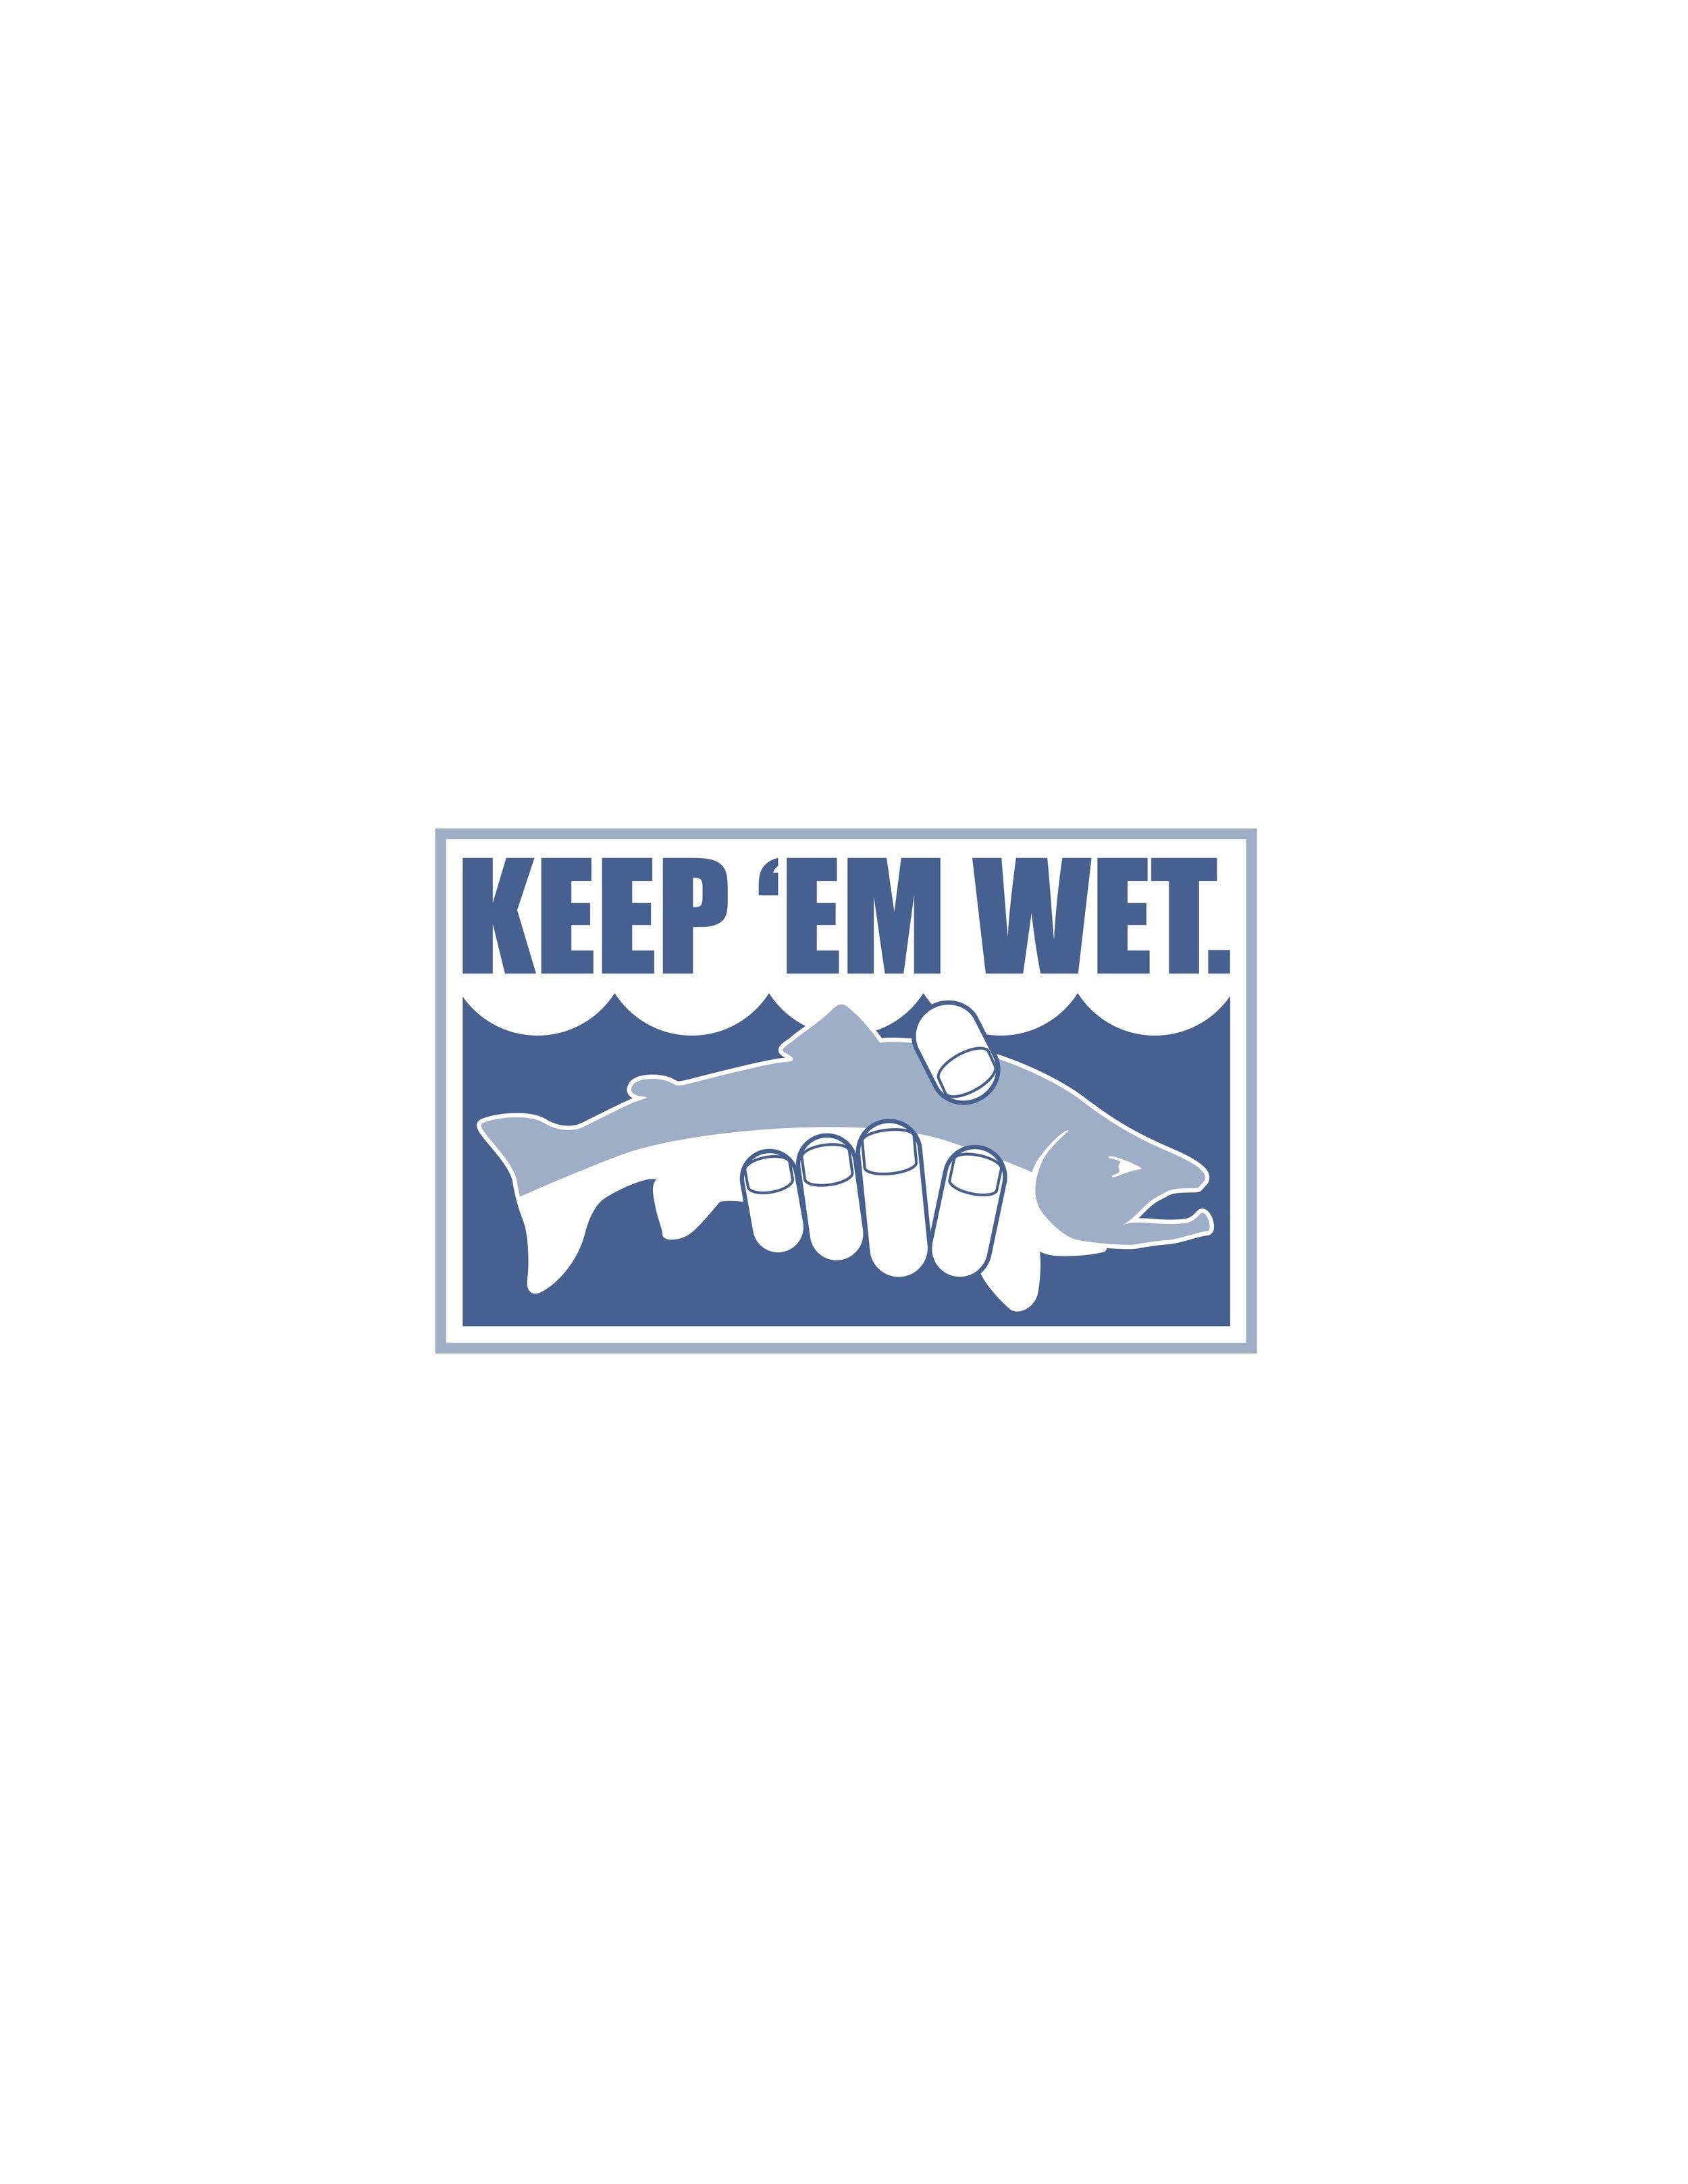 Keep_Em_Wet_logo.jpg